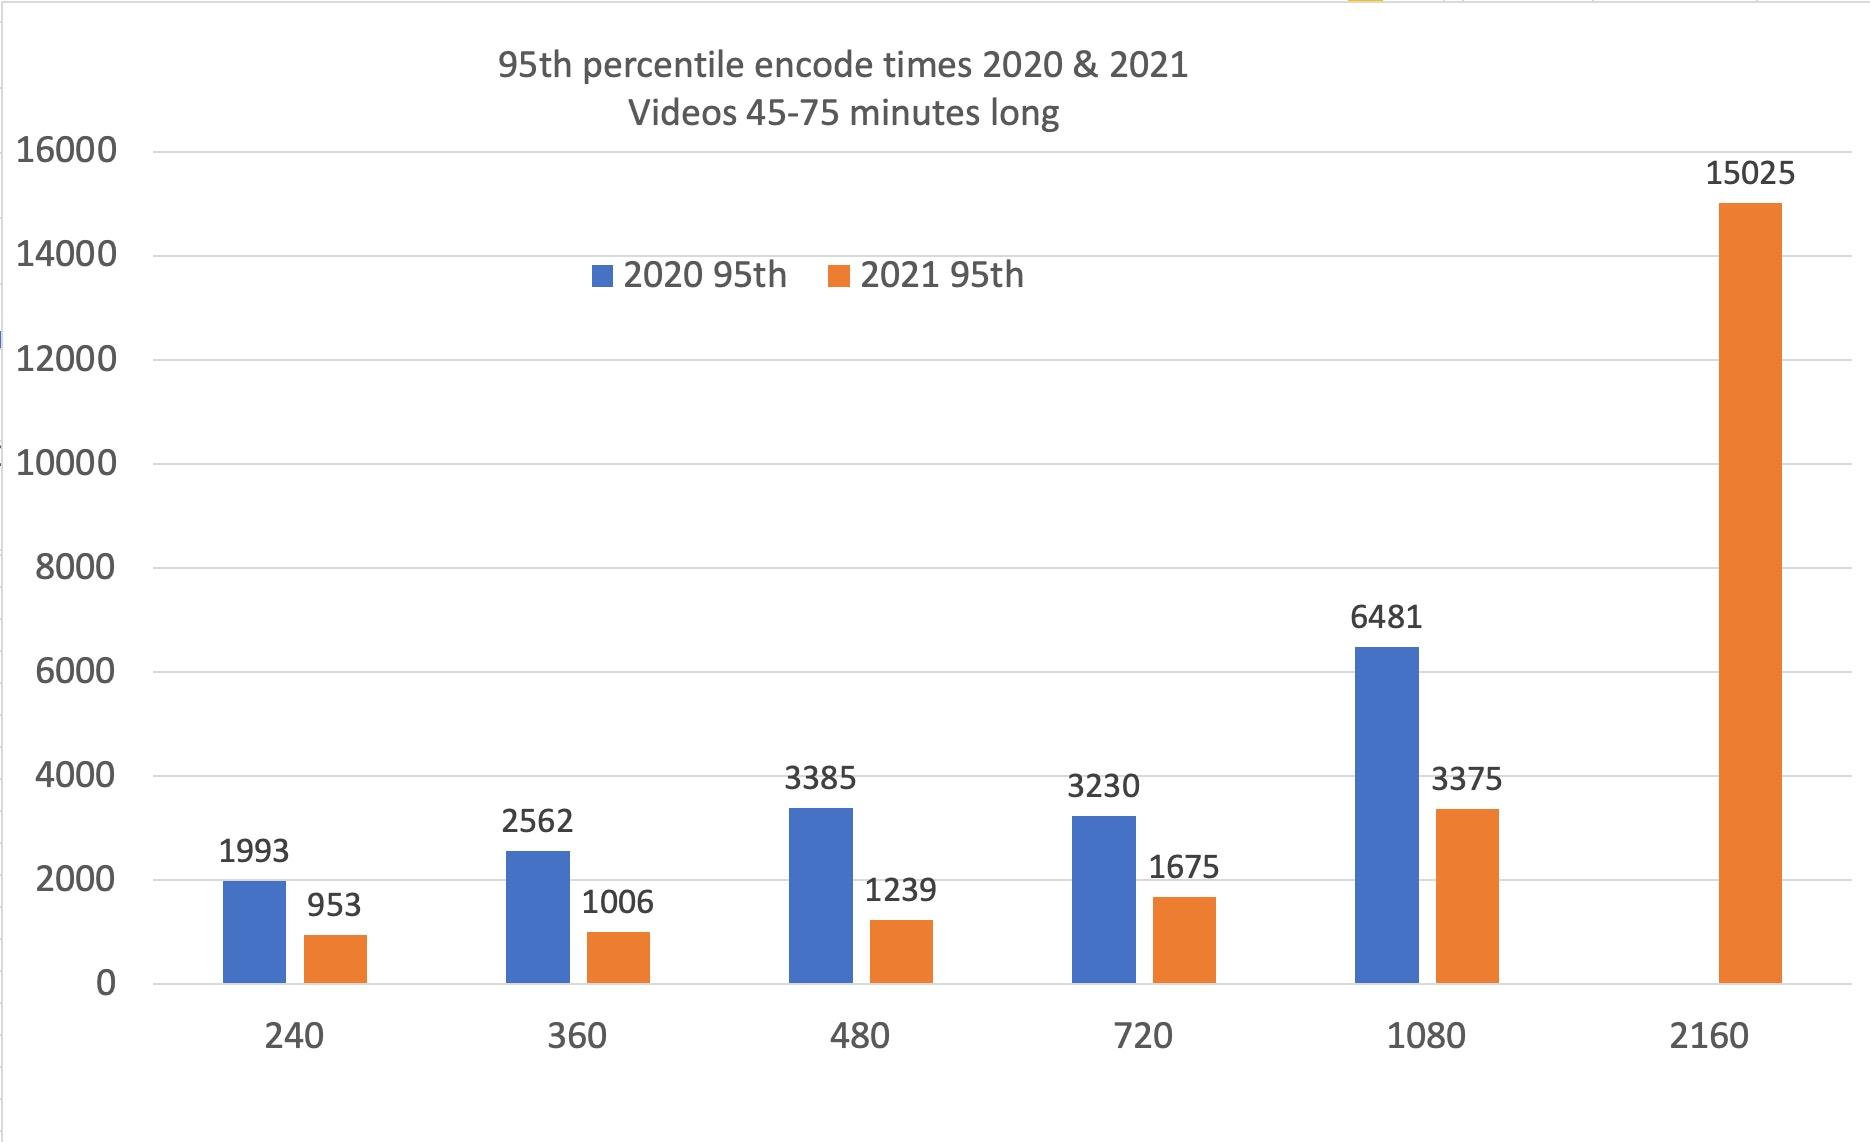 95th percentile encoding data 2020-2021